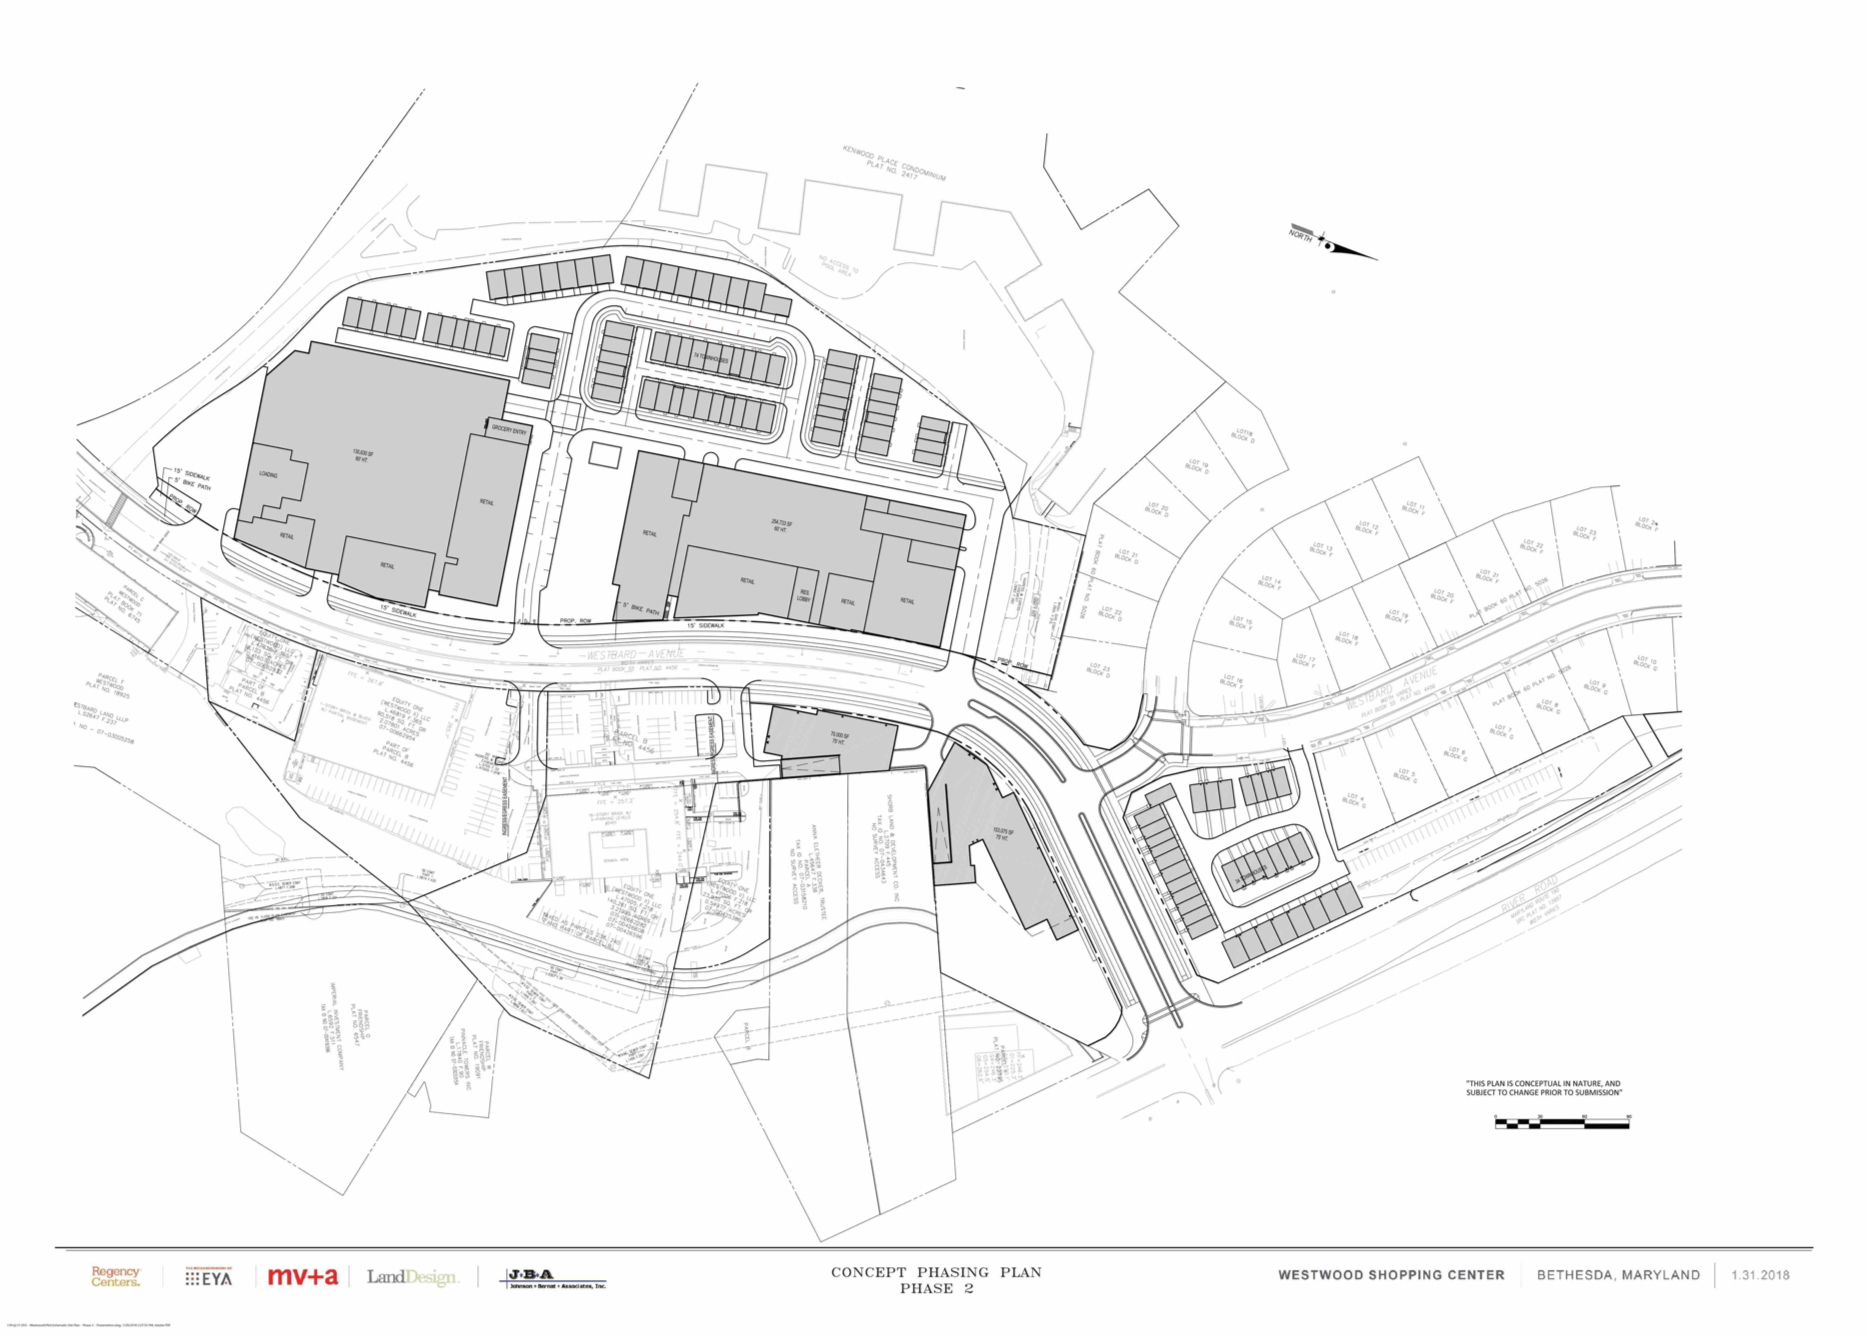 Phase 2 site plan